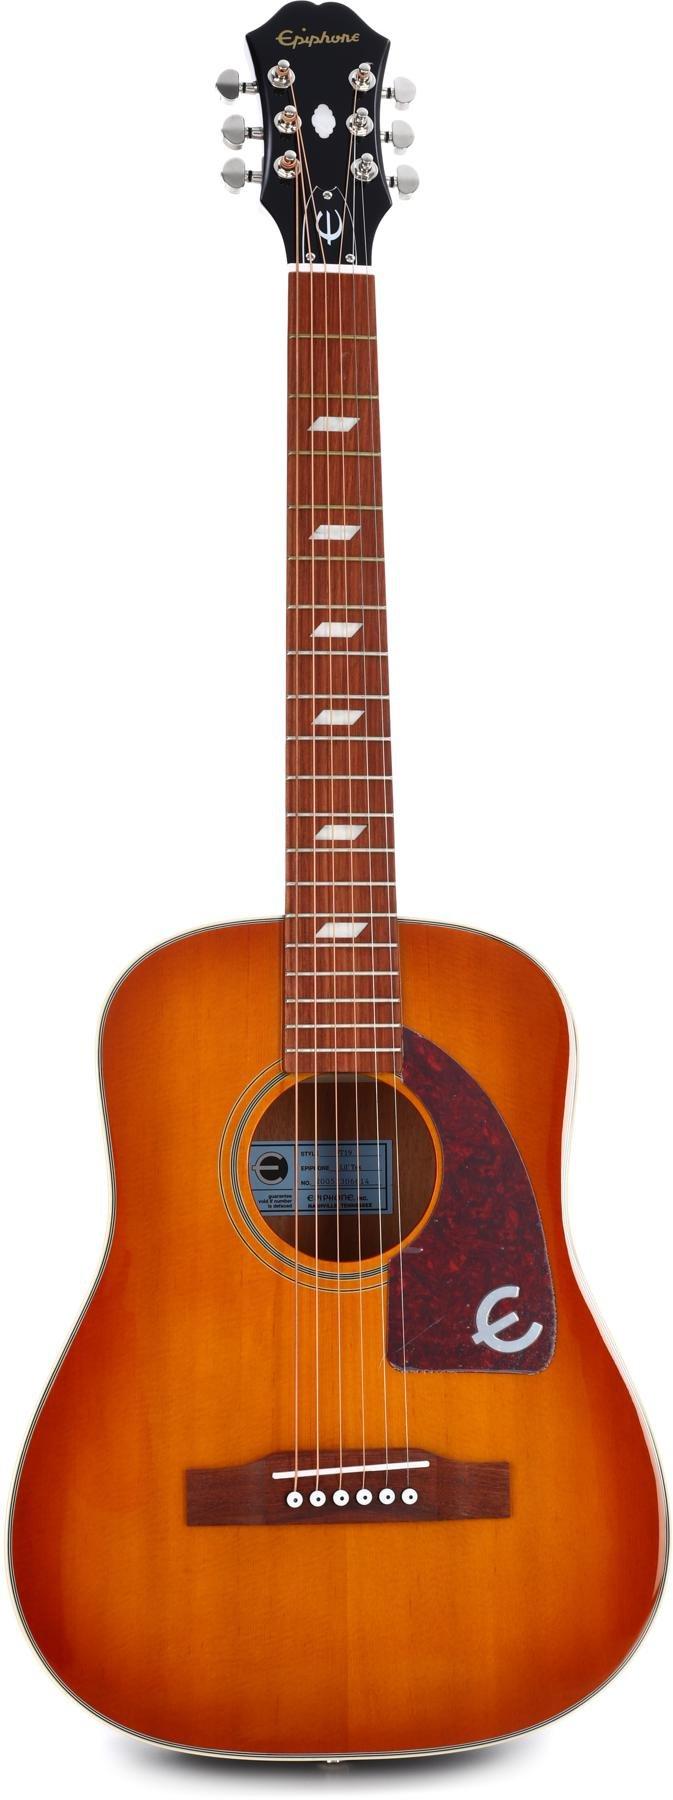 Faded Cherry Sunburst Epiphone Lil Tex Travel Electro Acoustic Guitar